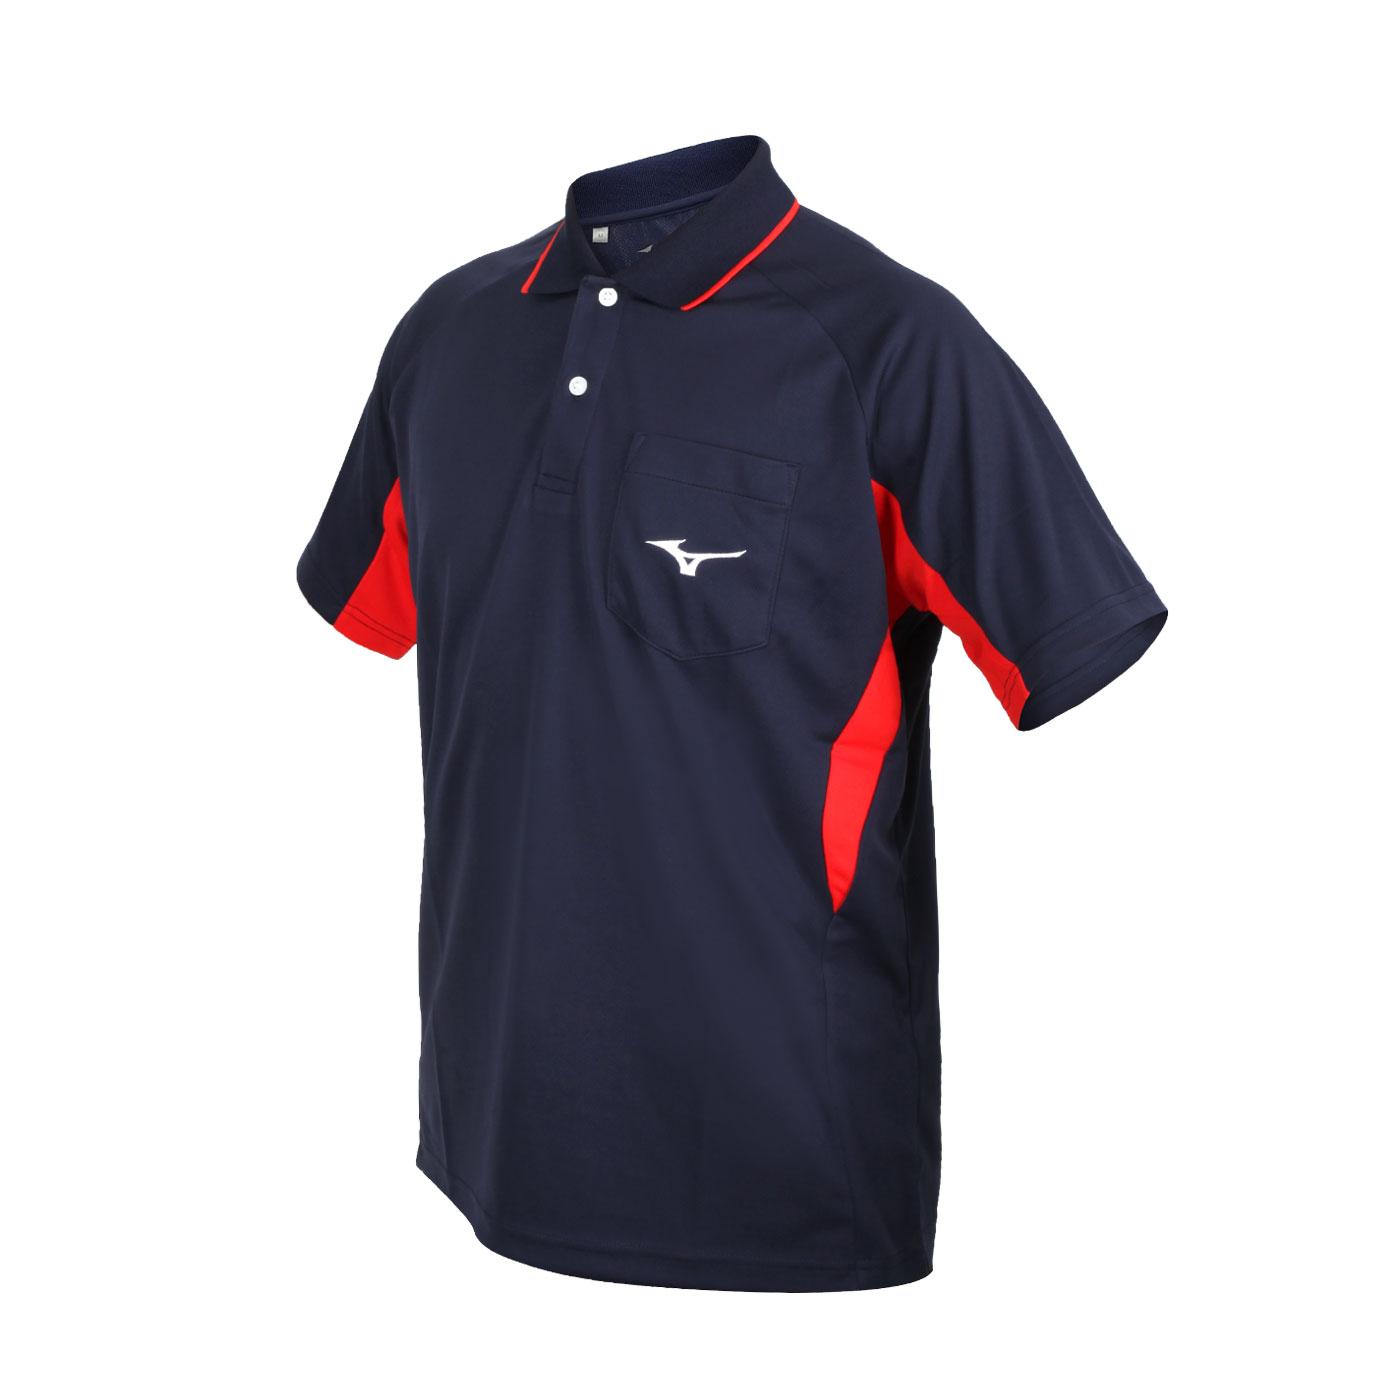 MIZUNO 男款短袖POLO衫 32TA102114 - 丈青紅白